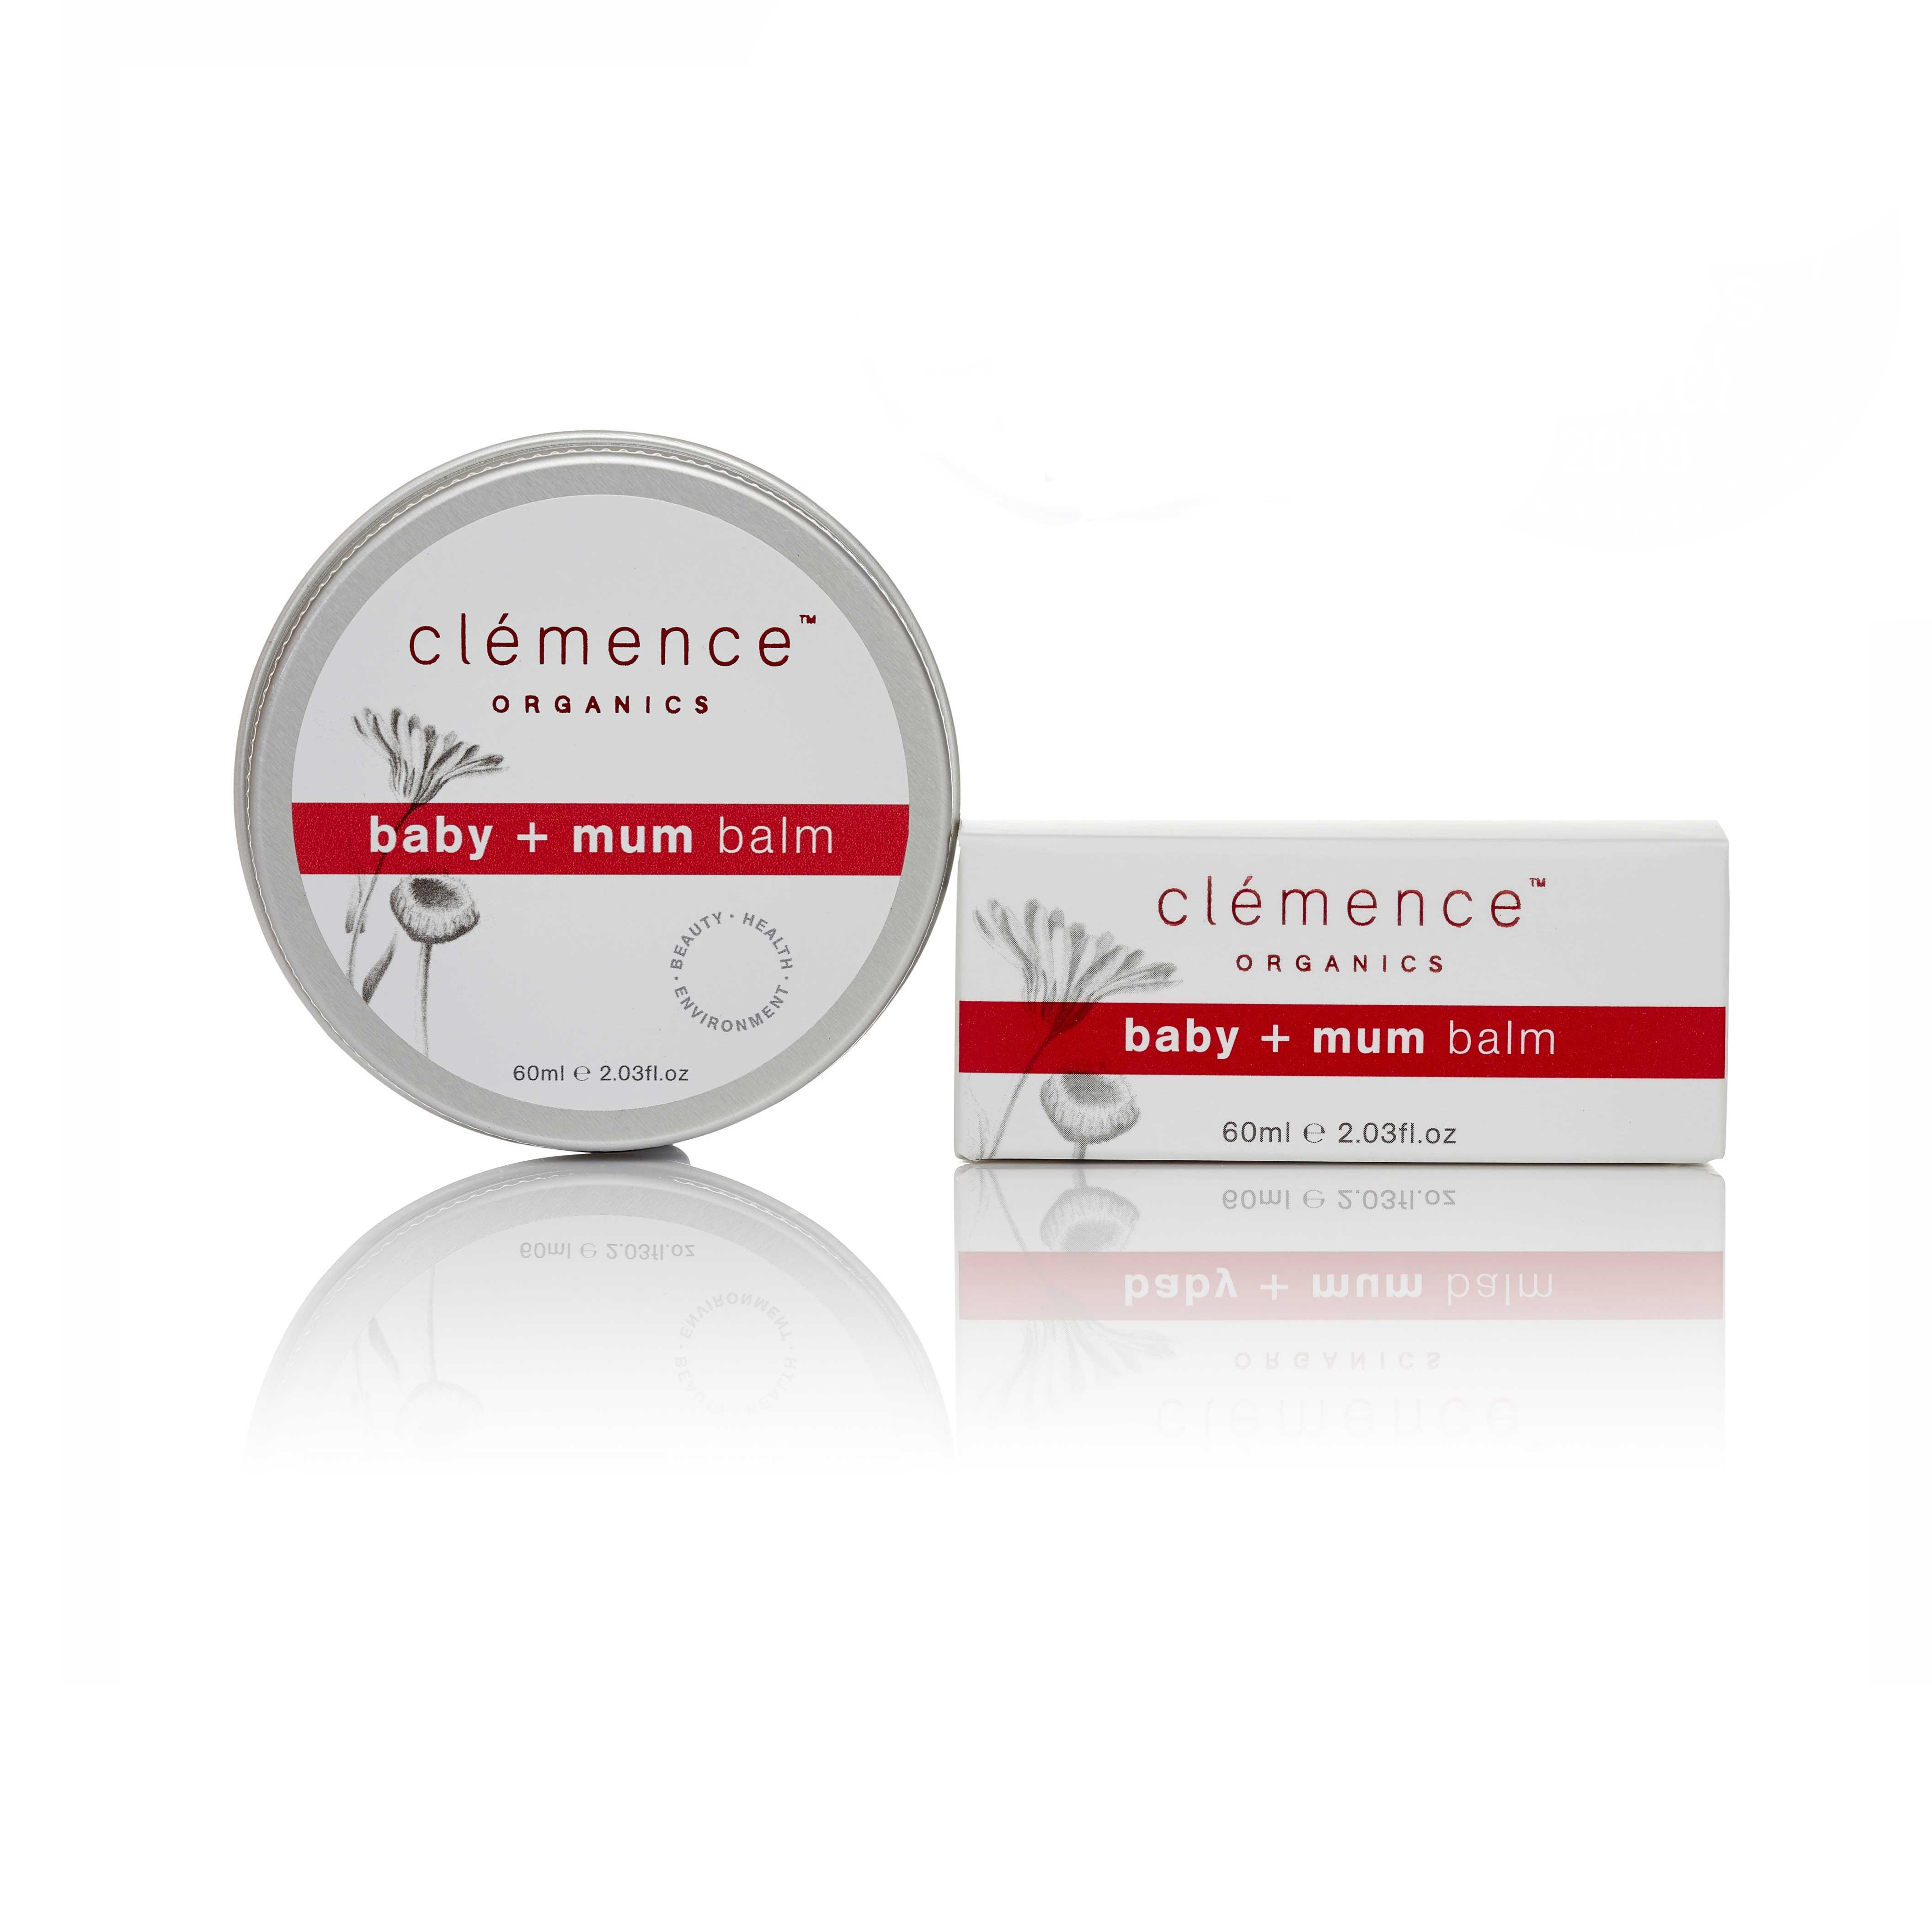 Clémence Organics 2 in 1 Face Scrub + Mask